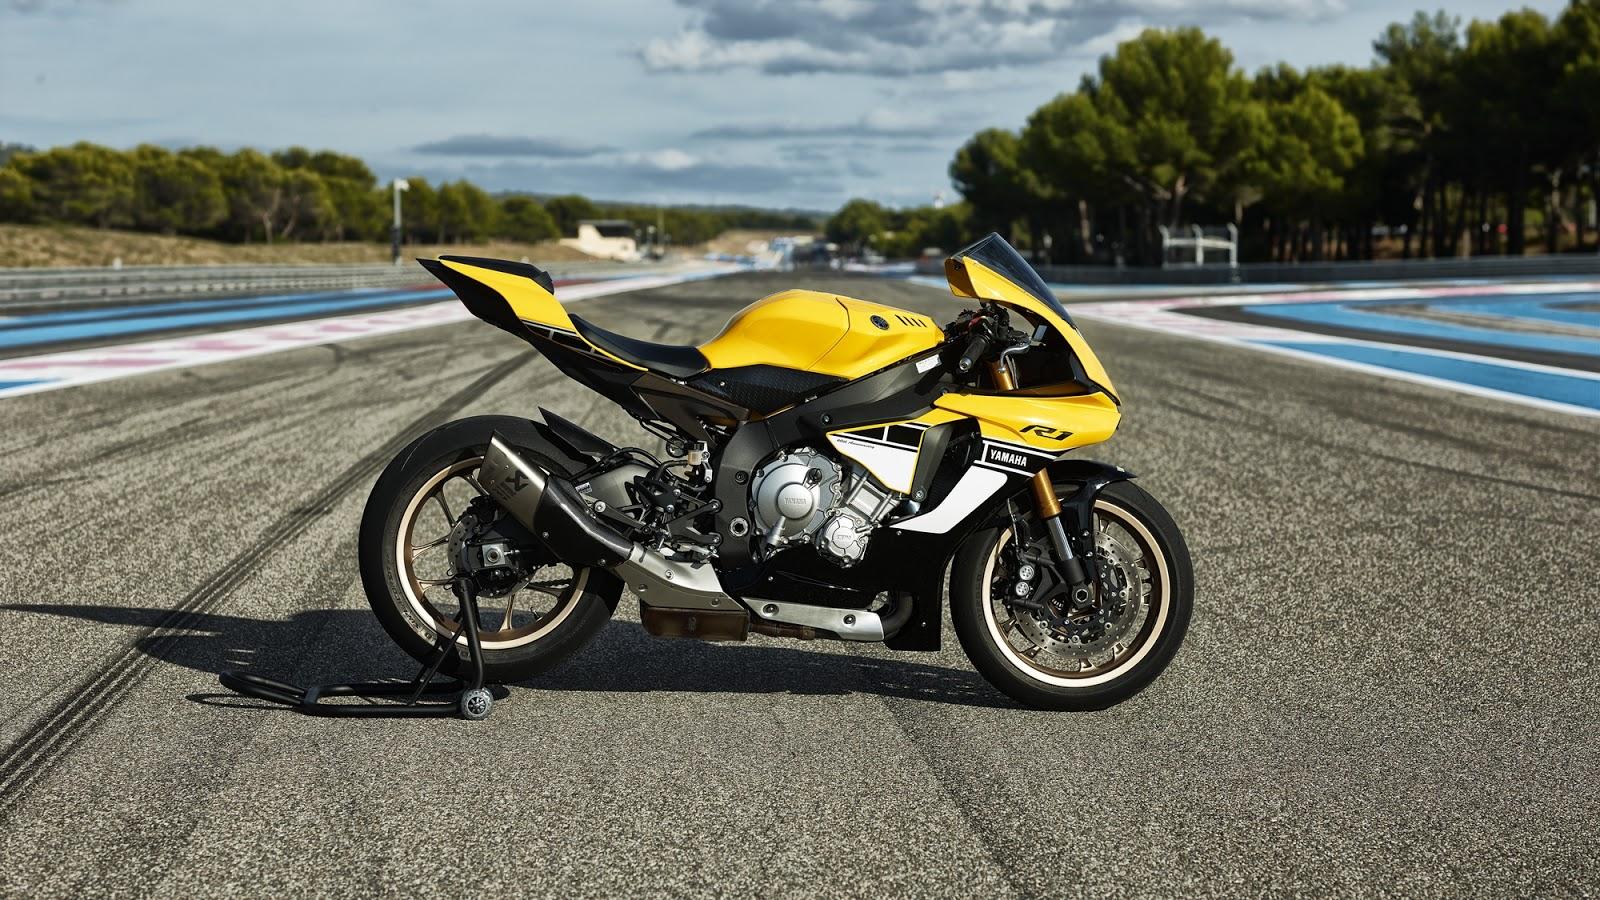 Racing Caf       Yamaha    YZF   R1    60th Anniversary 2016 Limited